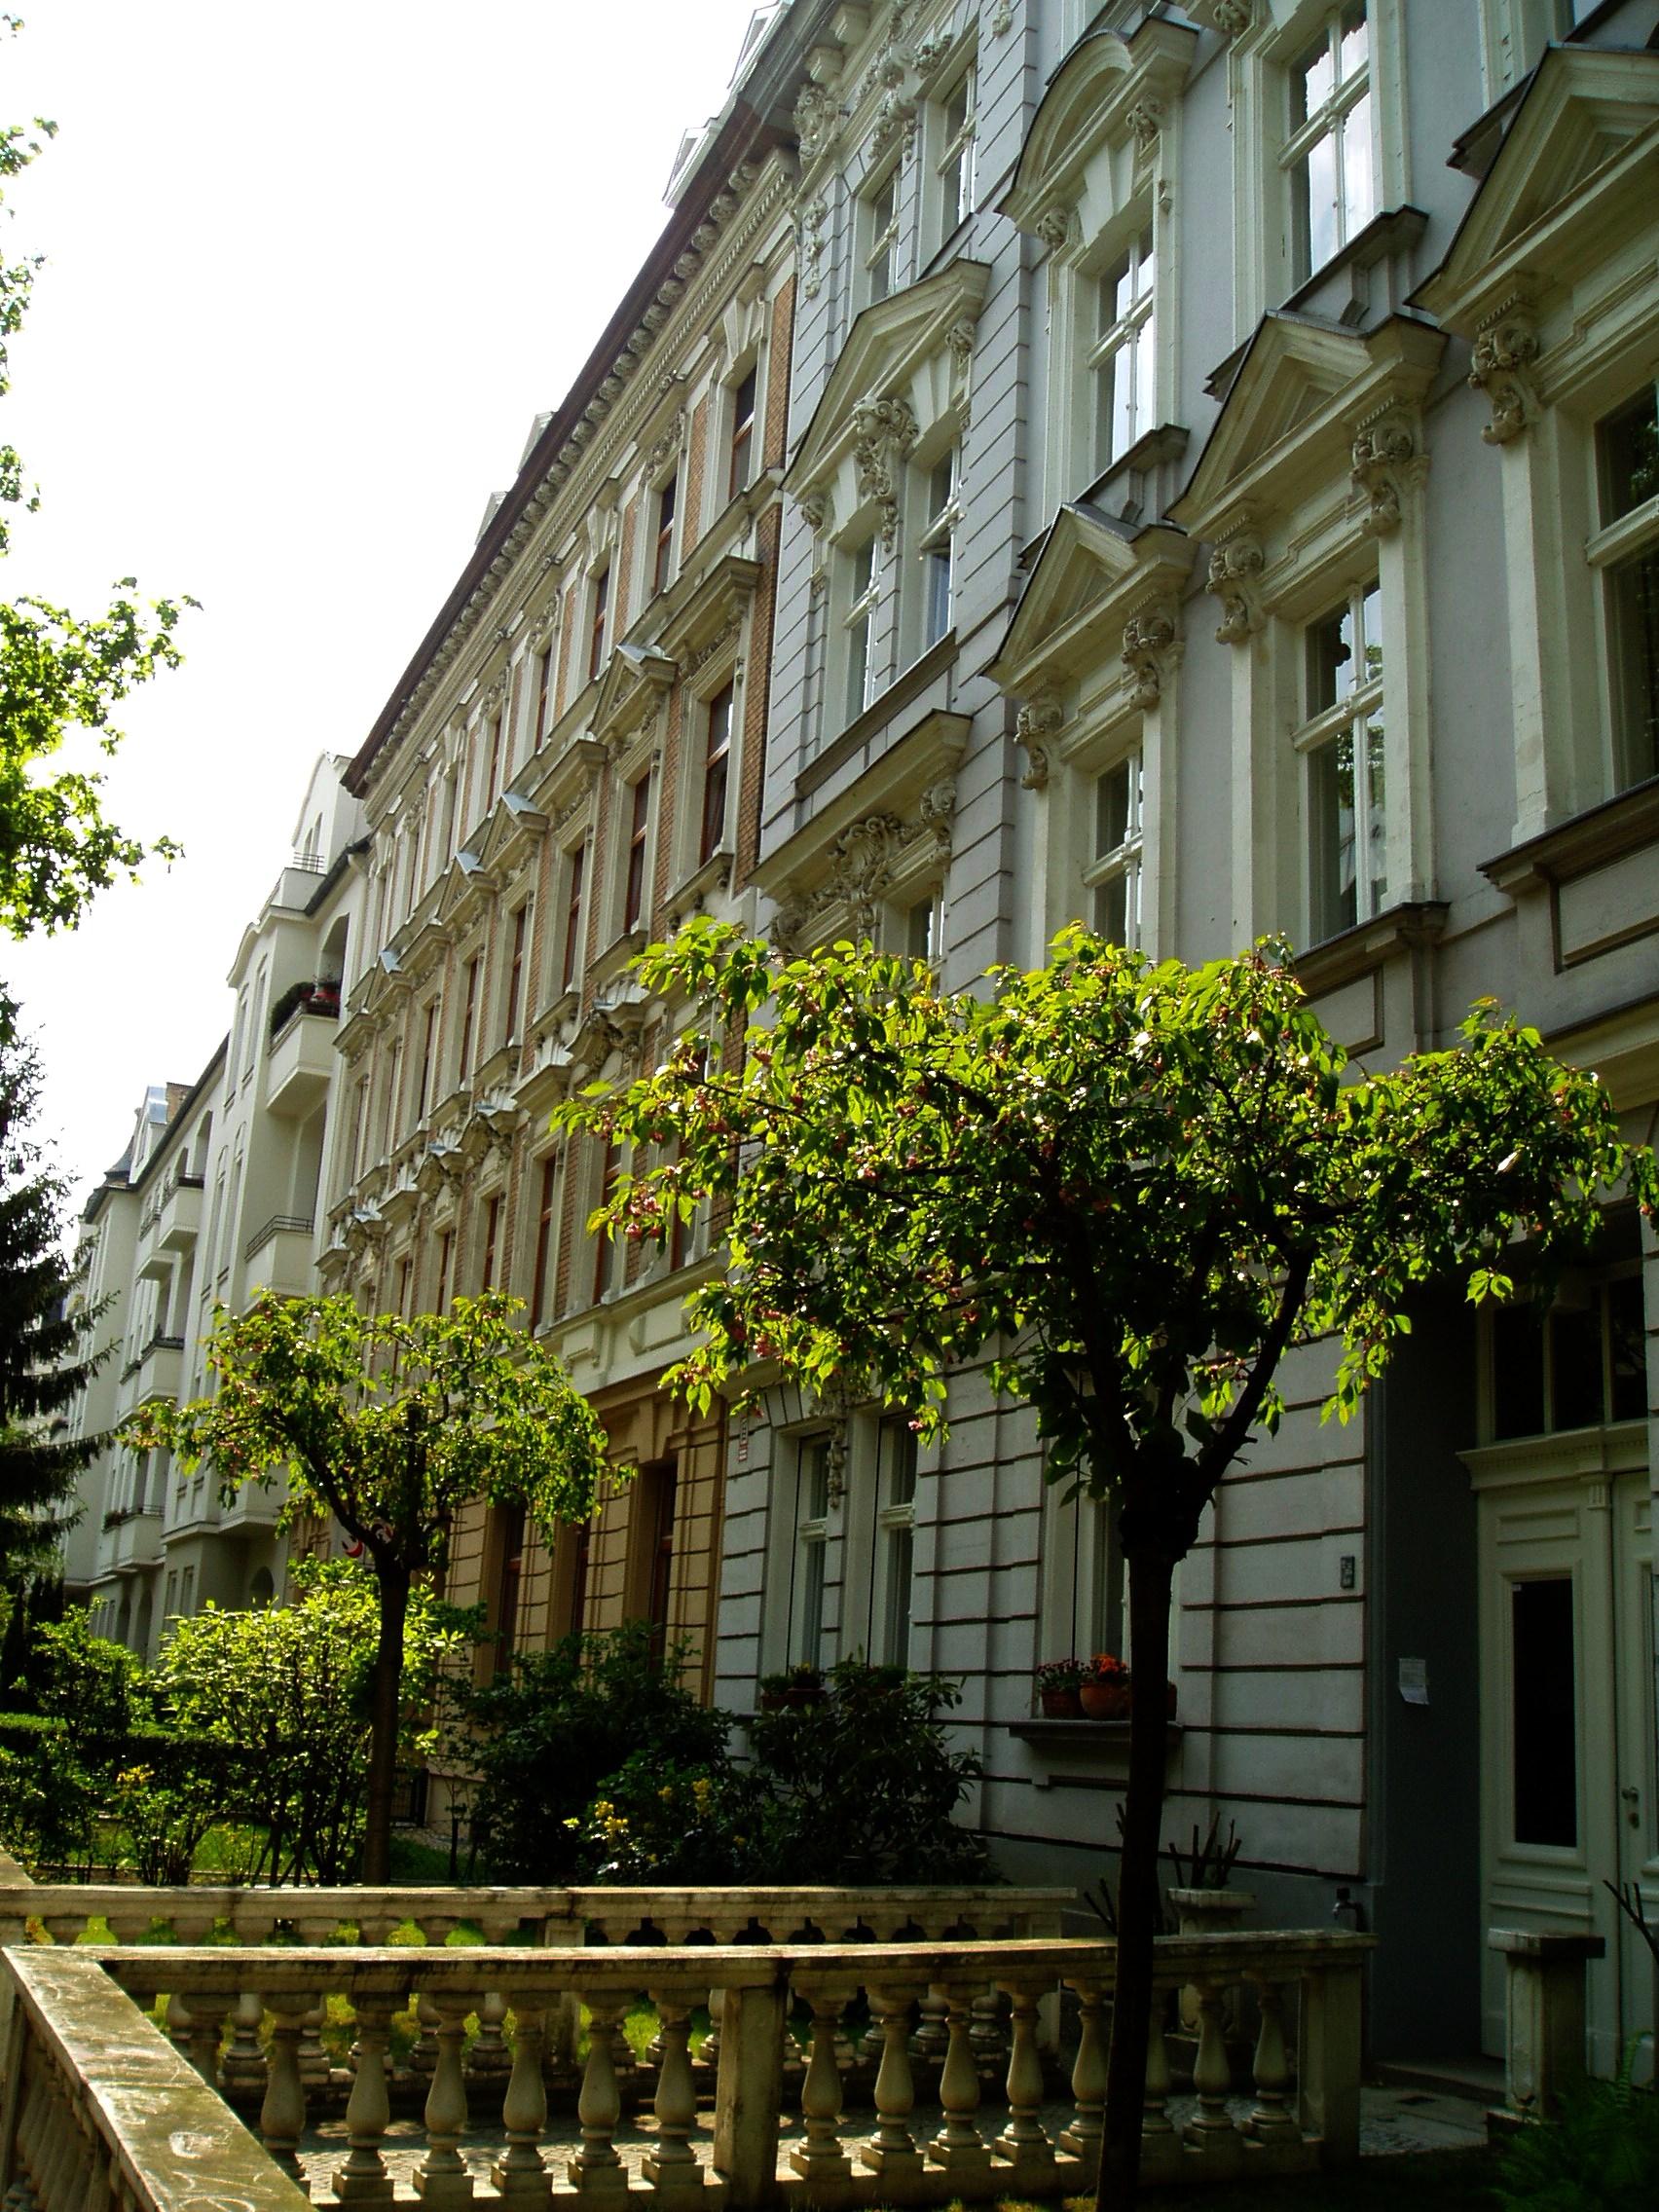 Filehouses in zimmermannstrasse berlin steglitz jpg